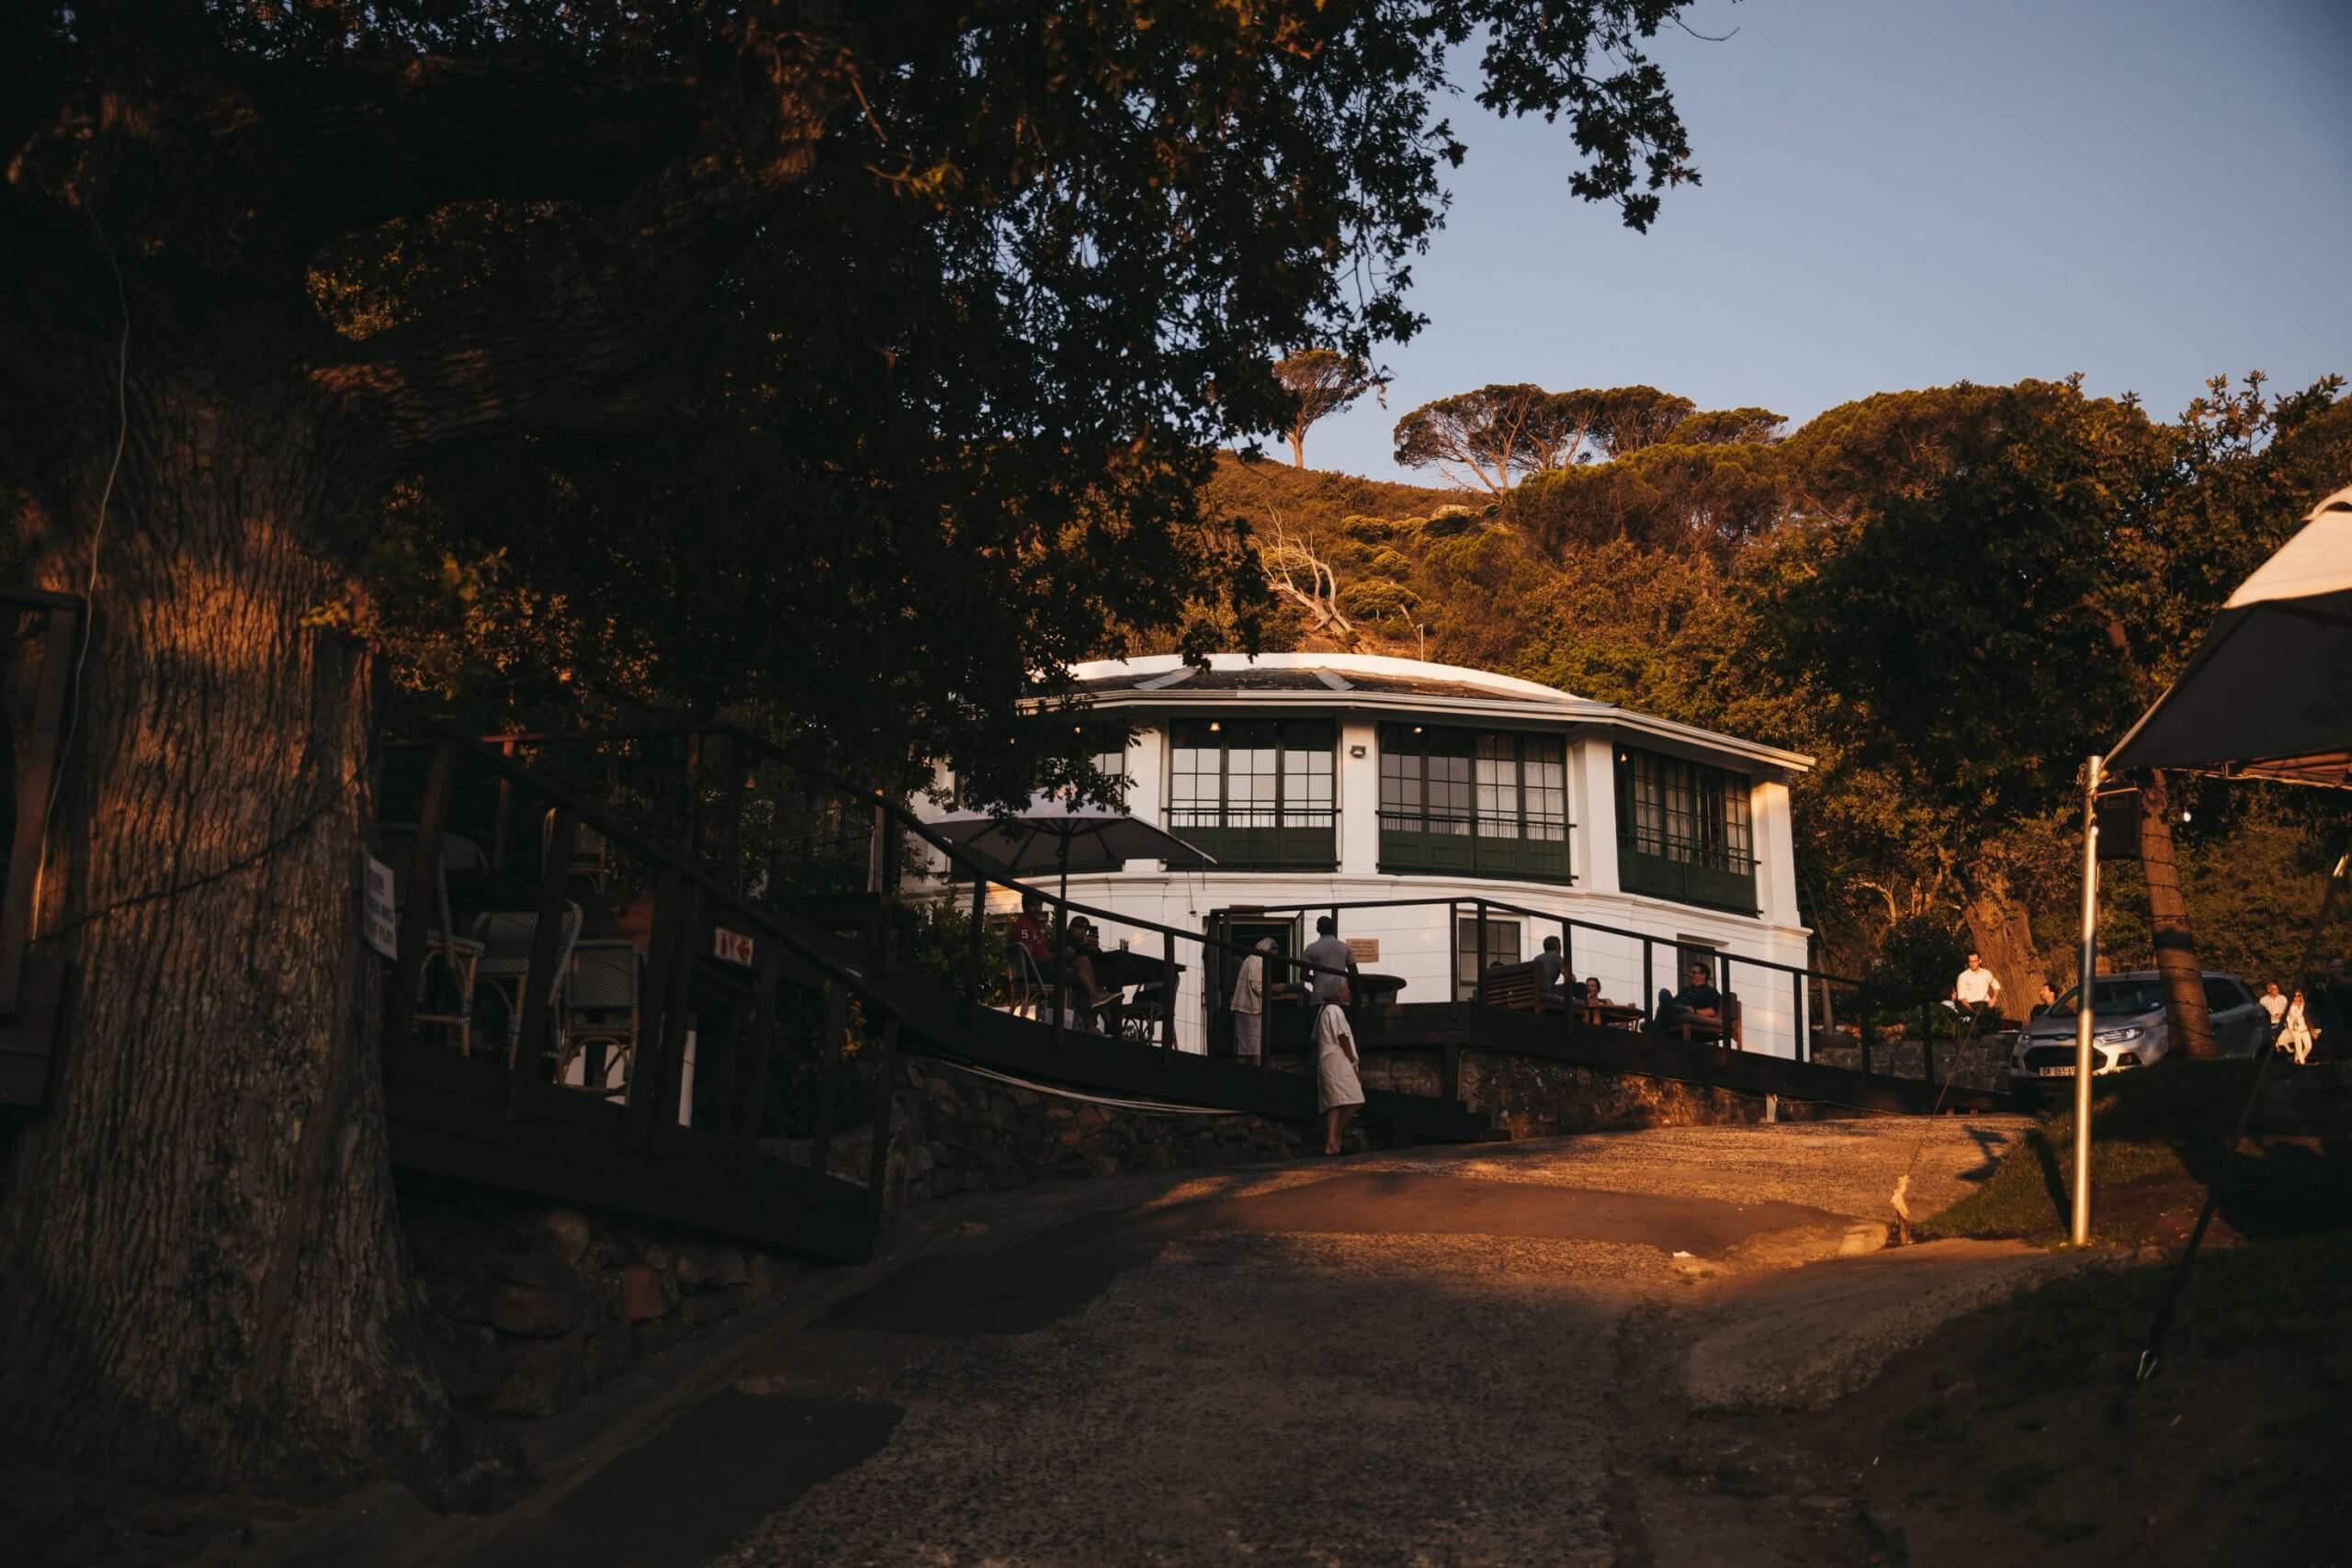 kapstaden roundhouse restaurang tips-11